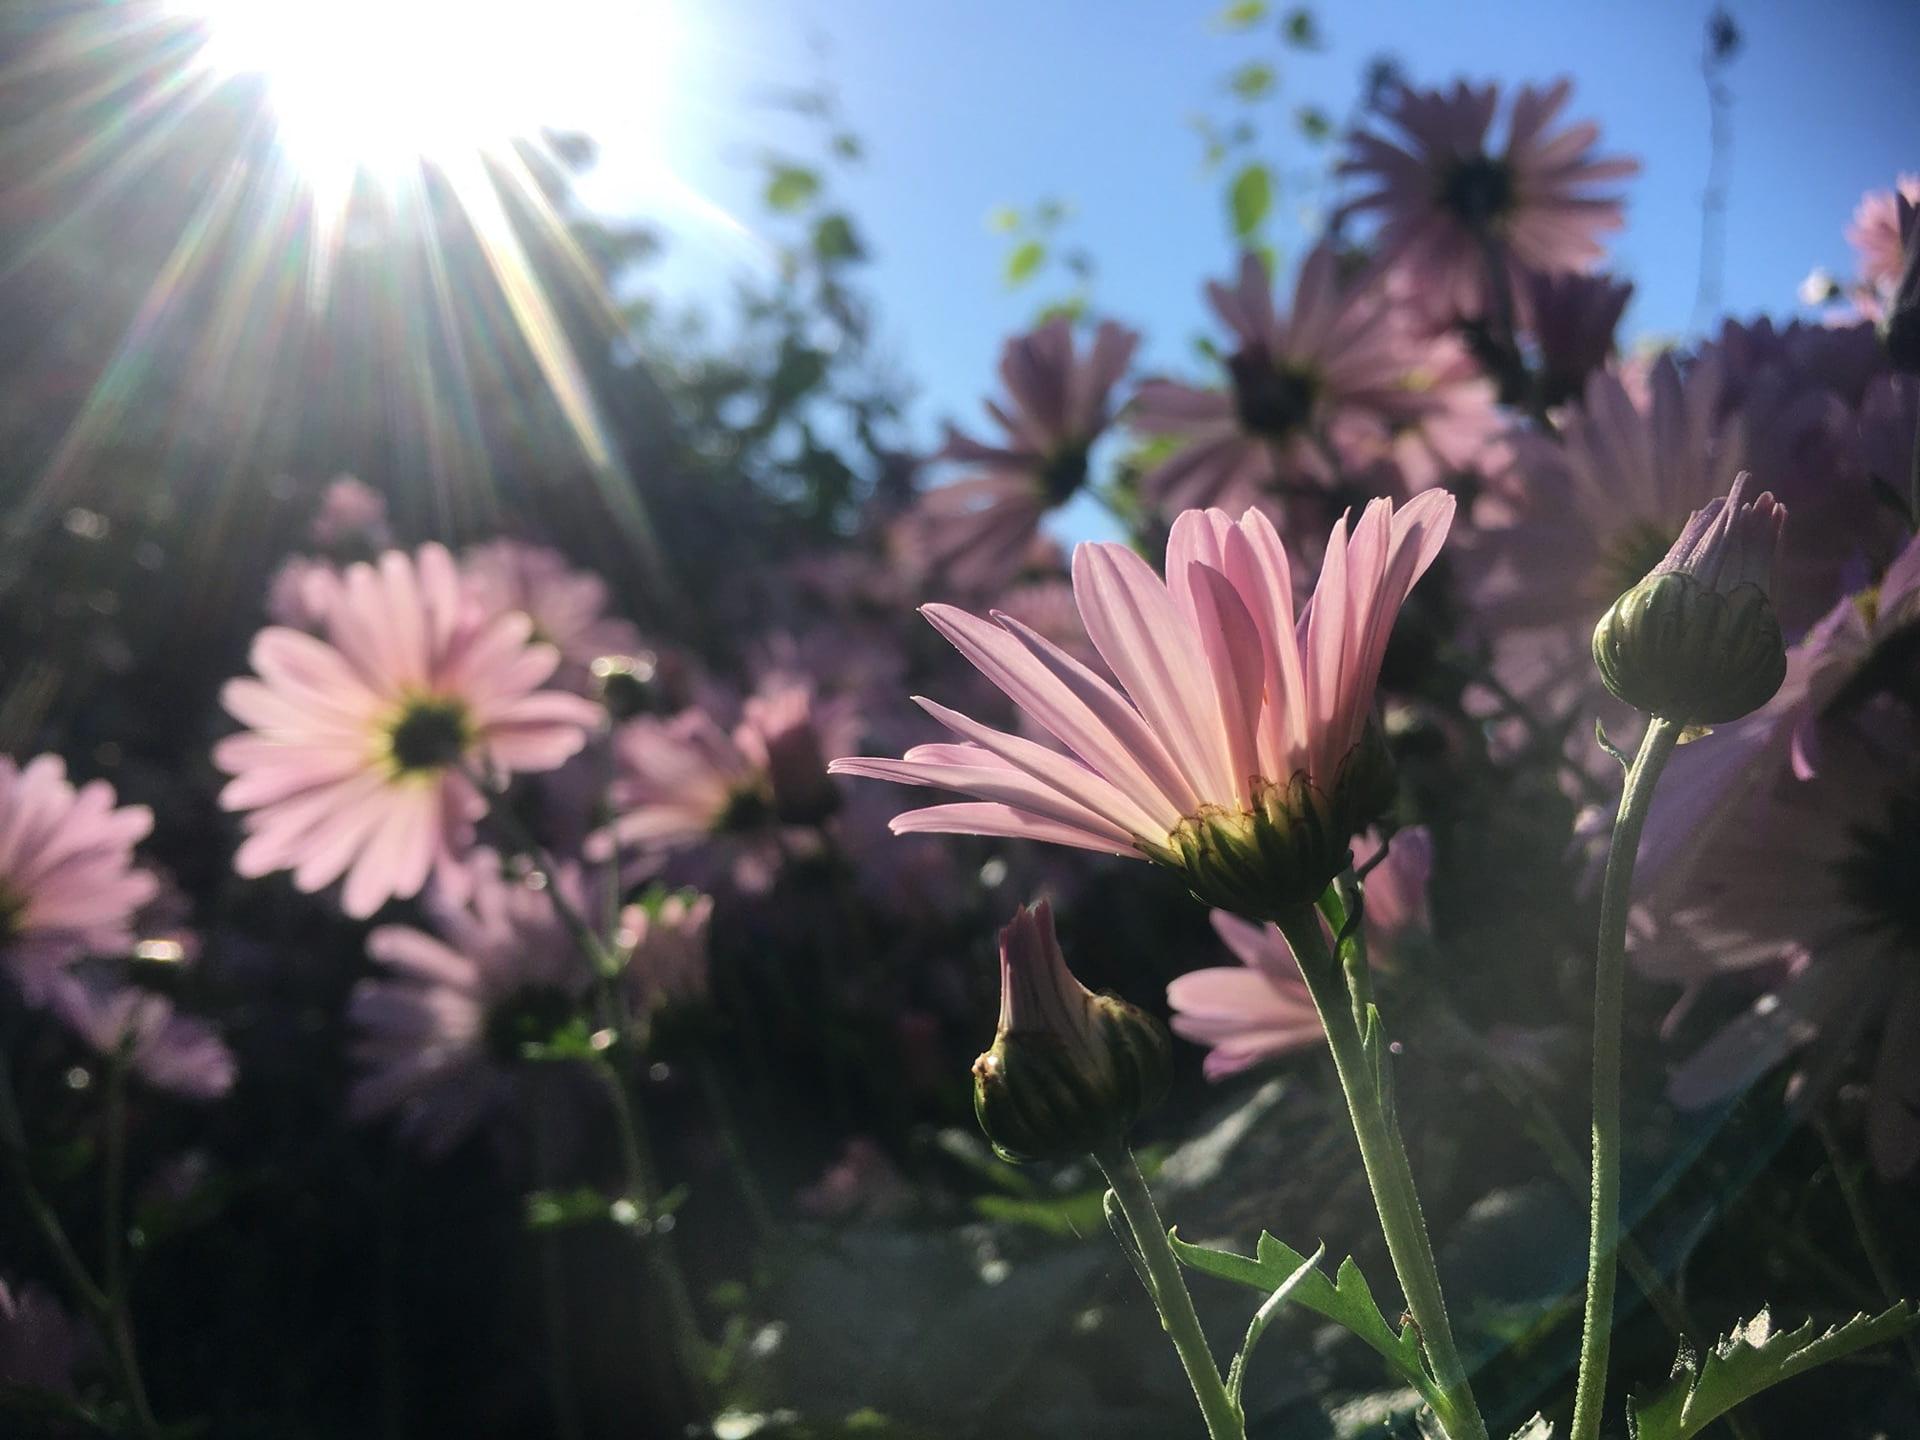 Chrysanthemum x rubellum 'Clara Curtis' reaches for the sunlight.